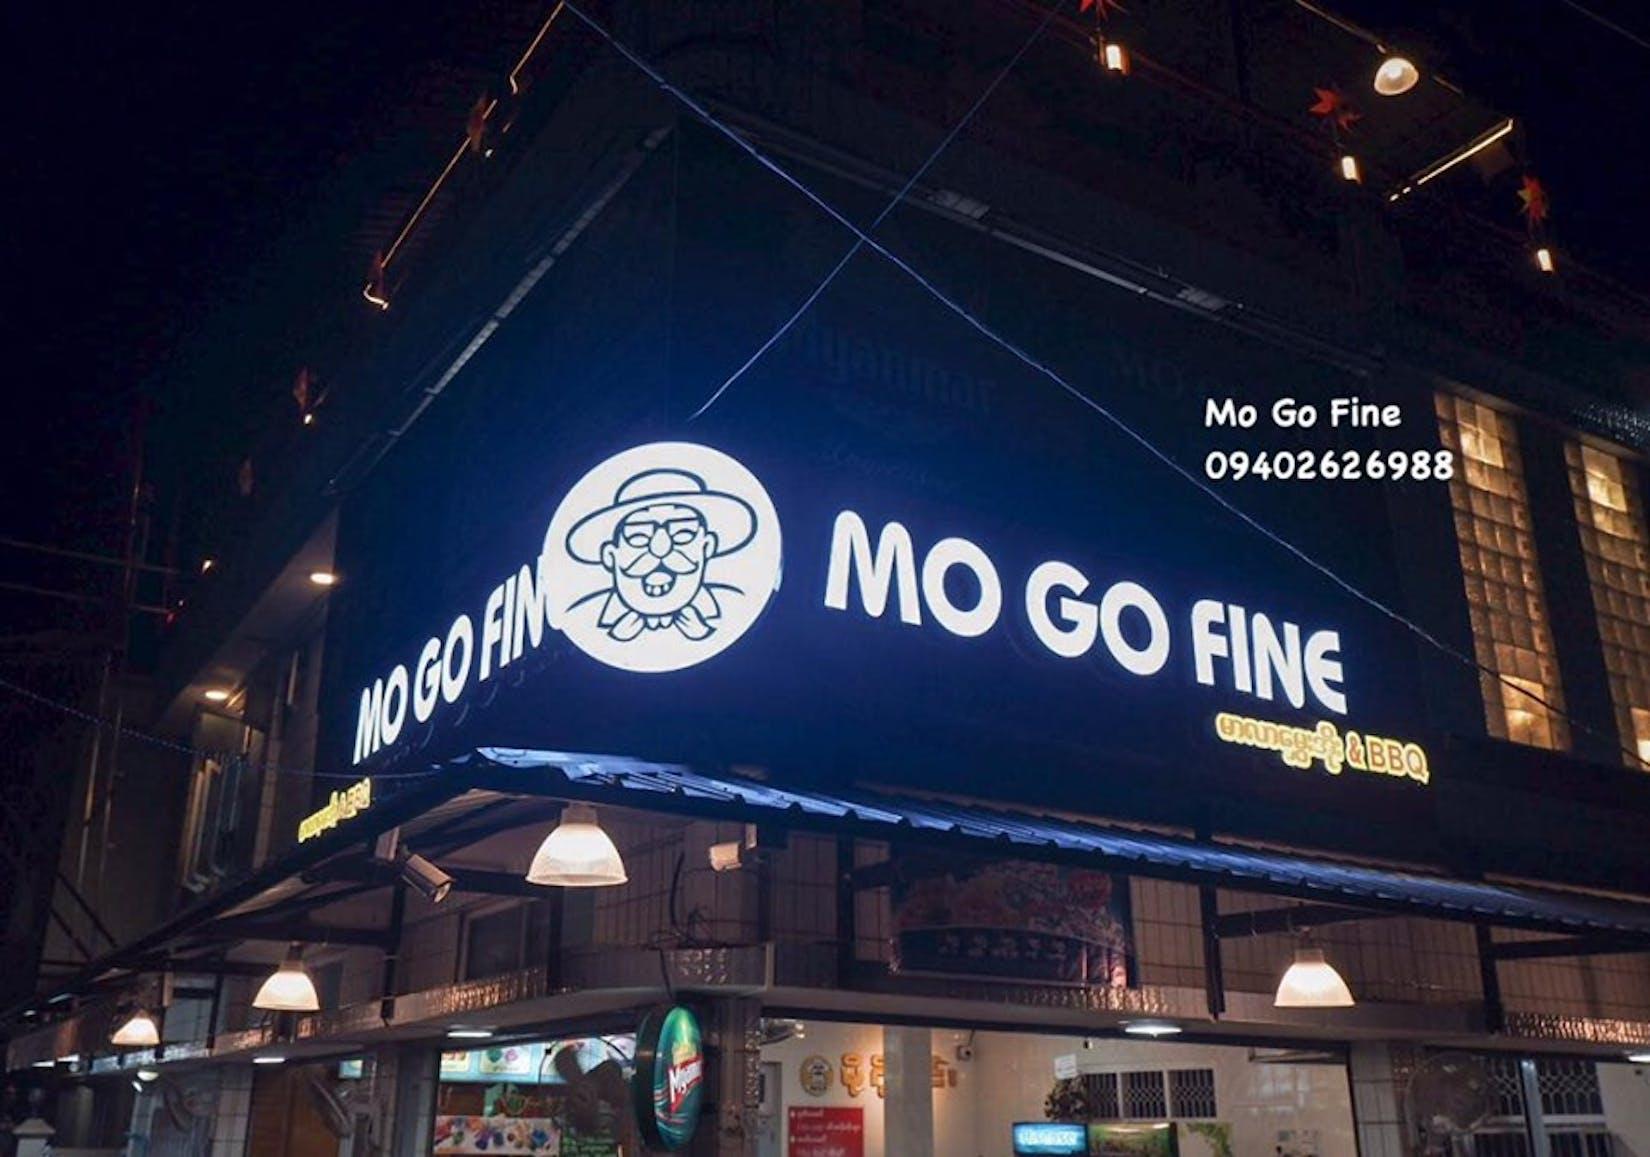 Mo Go Fine BBQ & Restaurant | yathar